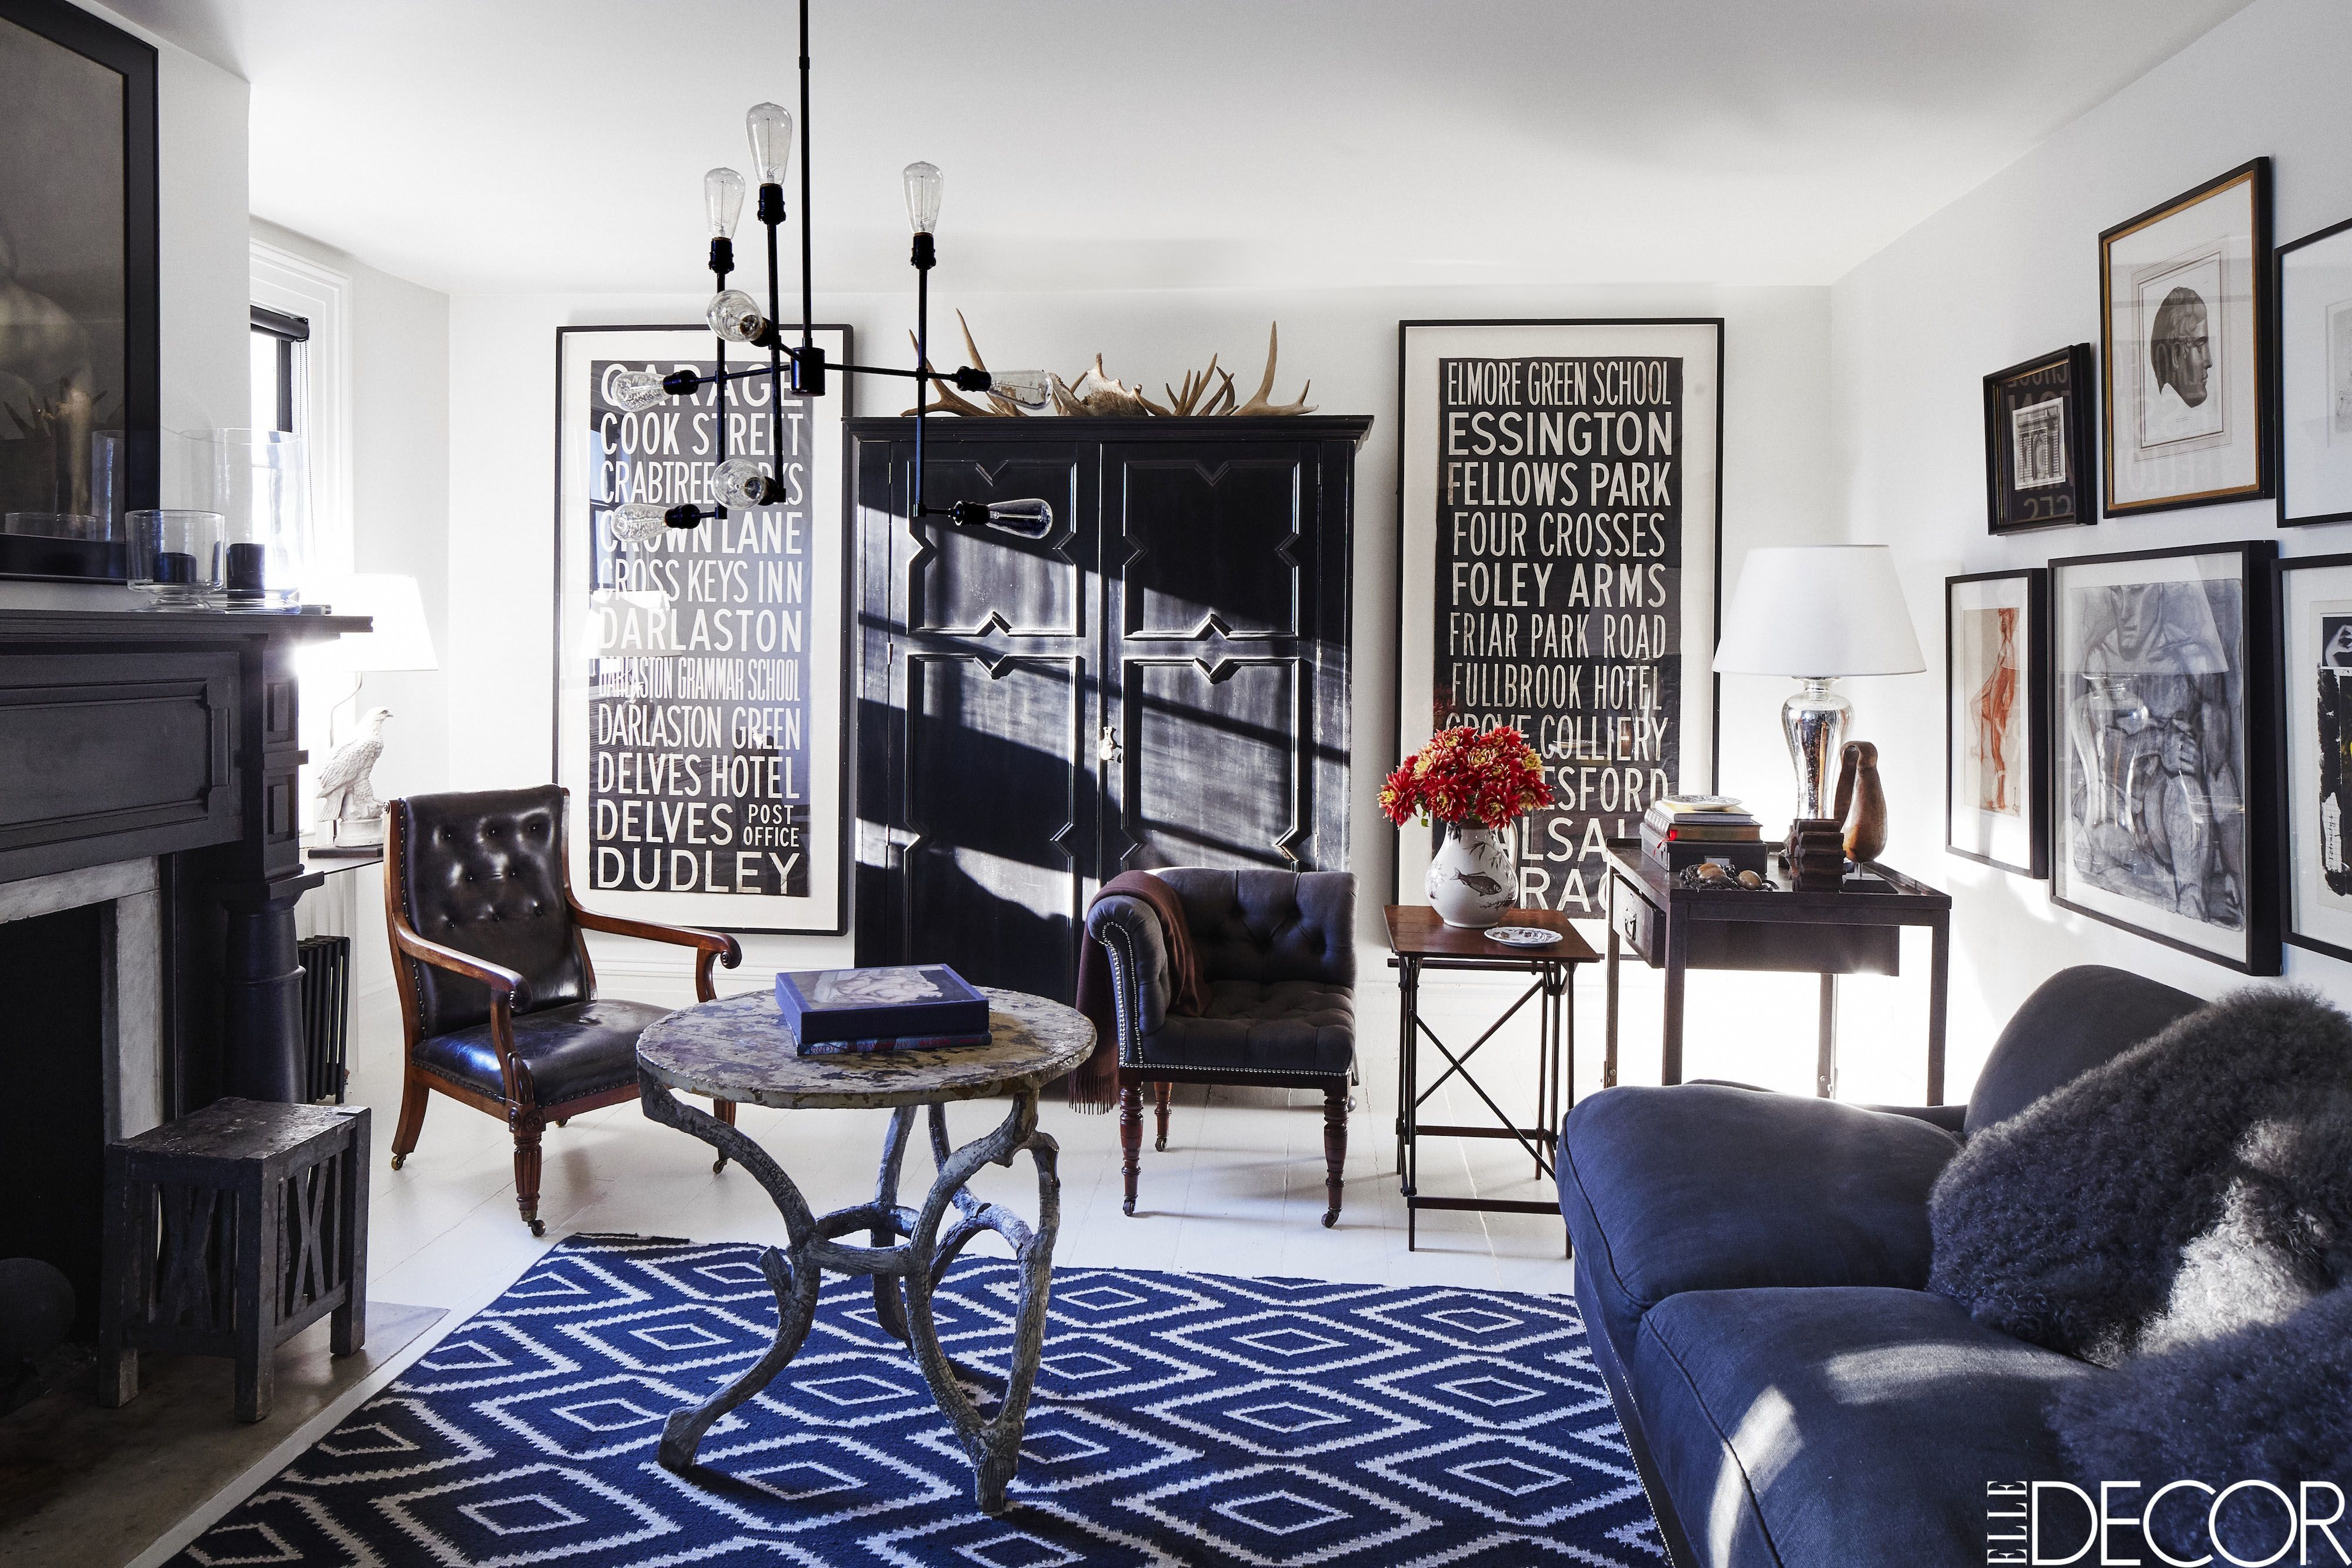 Best Small Living Room Design Ideas Small Living Room